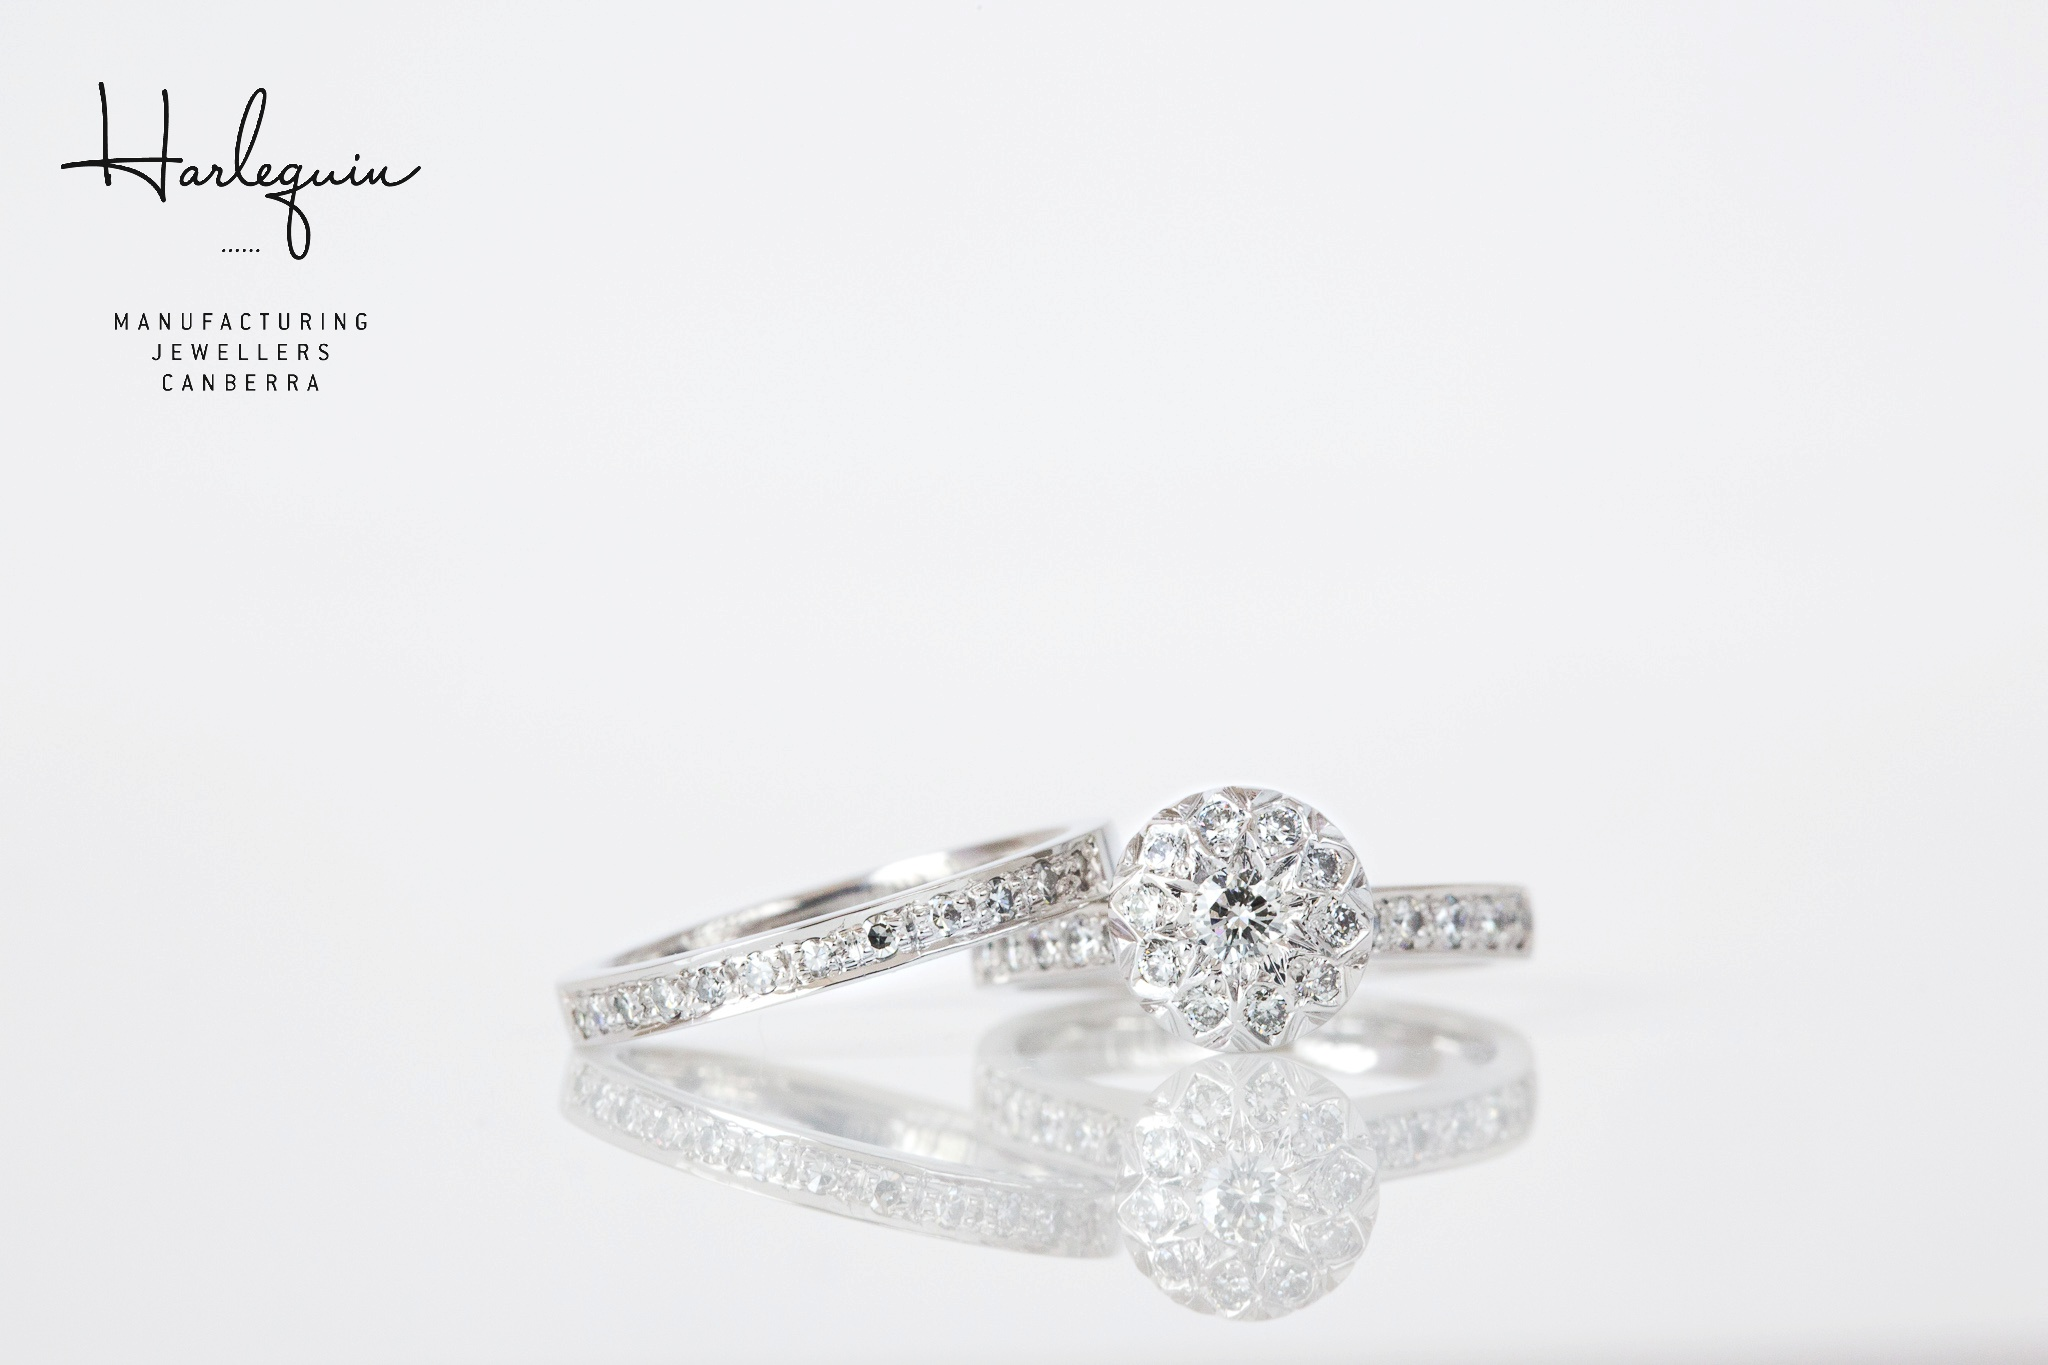 Remodelled illusion set diamond engagemeng ring - Harlequin Jewellers Canberra.jpg